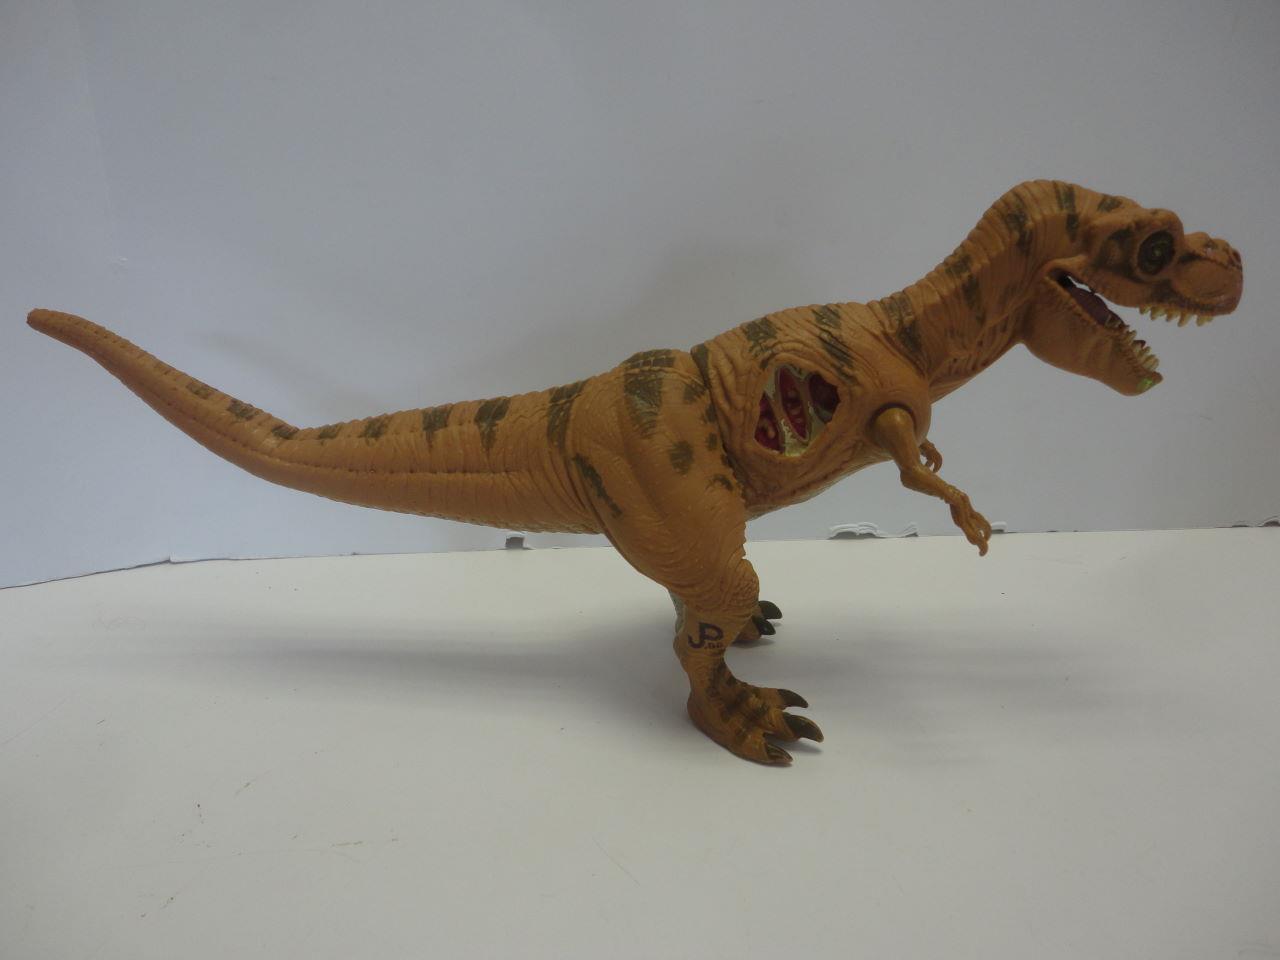 Jurassic Park Dinosaur Action Figure JP 06 Young Tyrannosaurus Rex T-Rex JP06